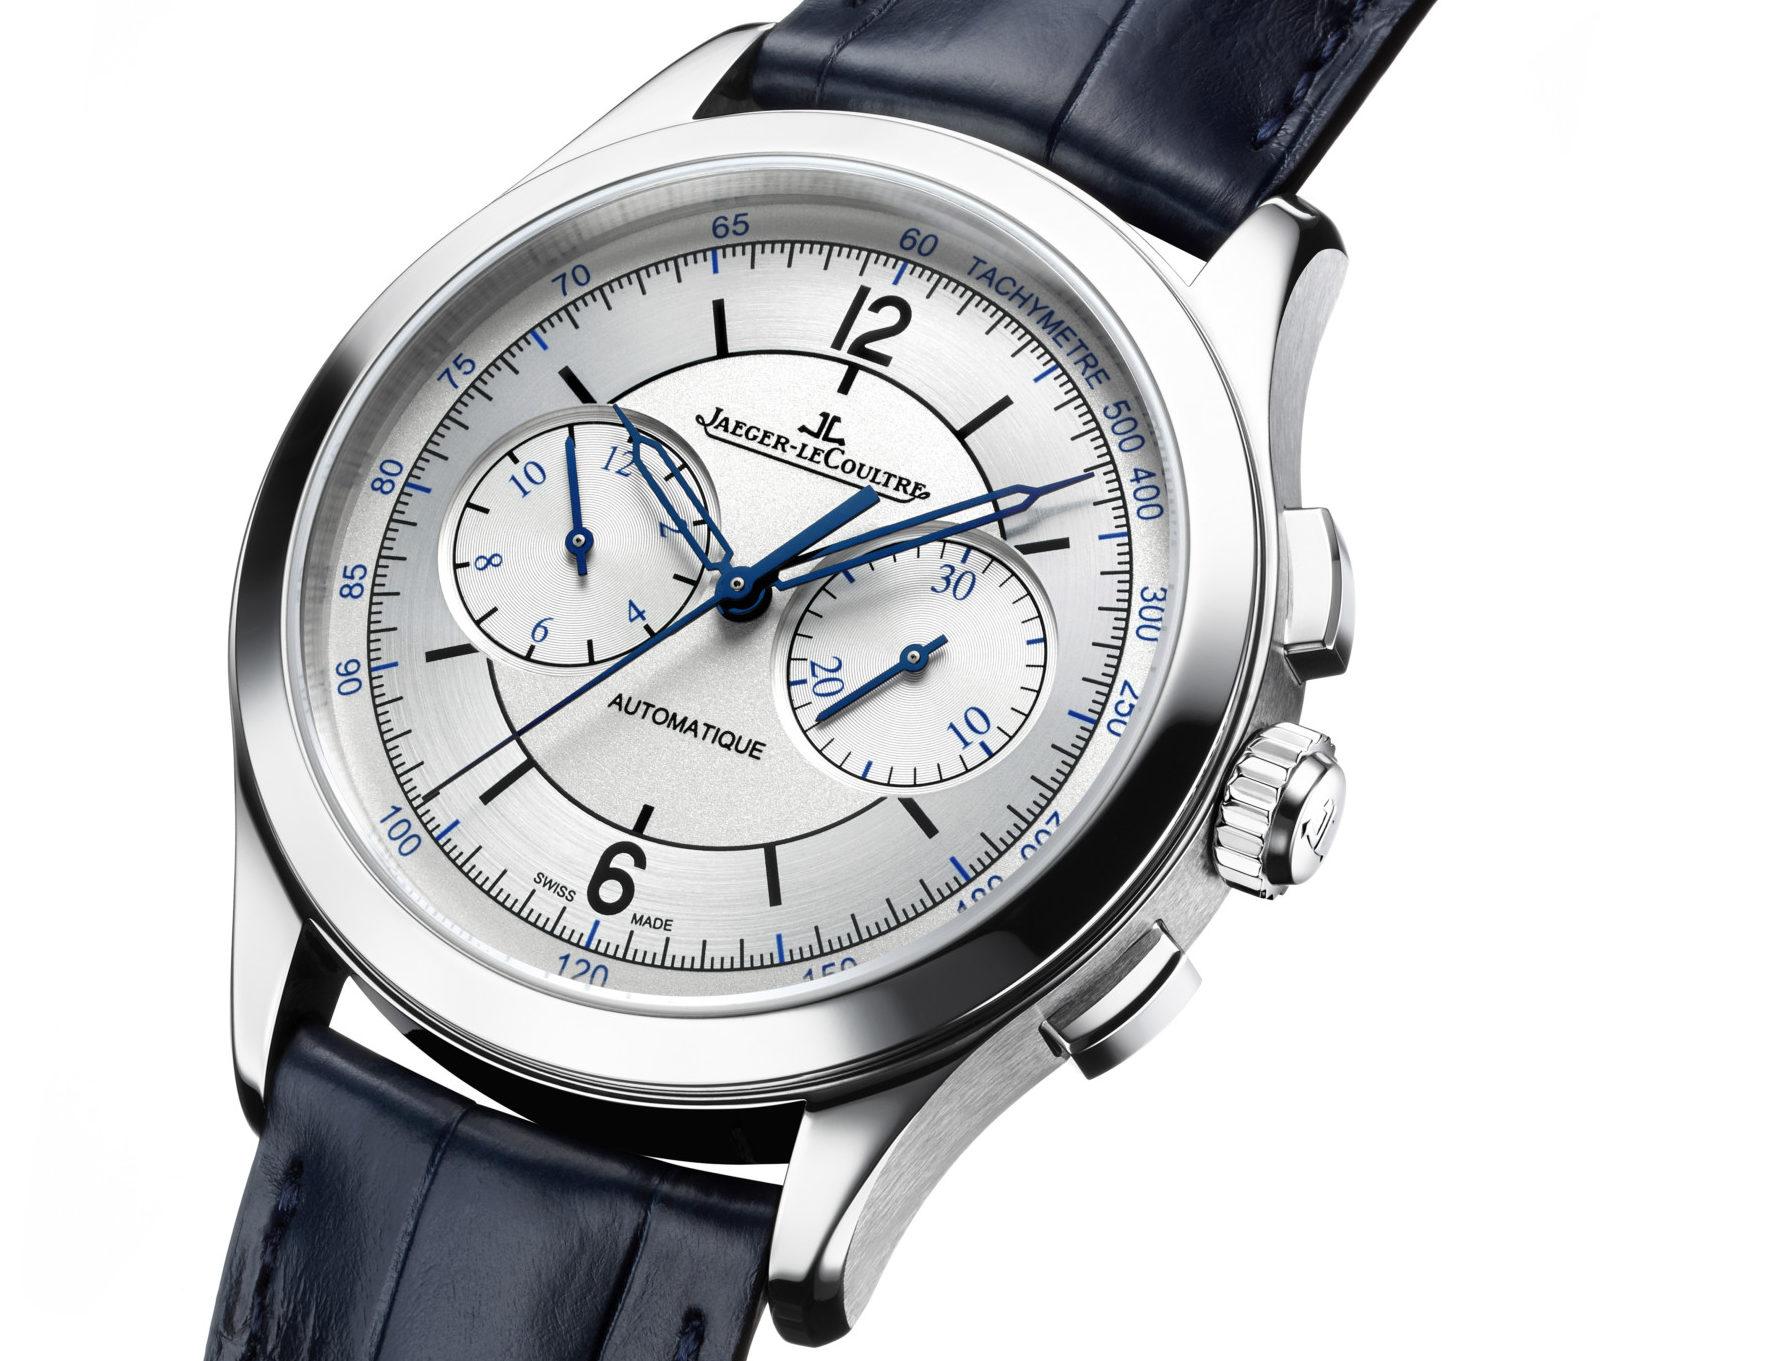 Jaeger-LeCoultre Master Chronograph_profile